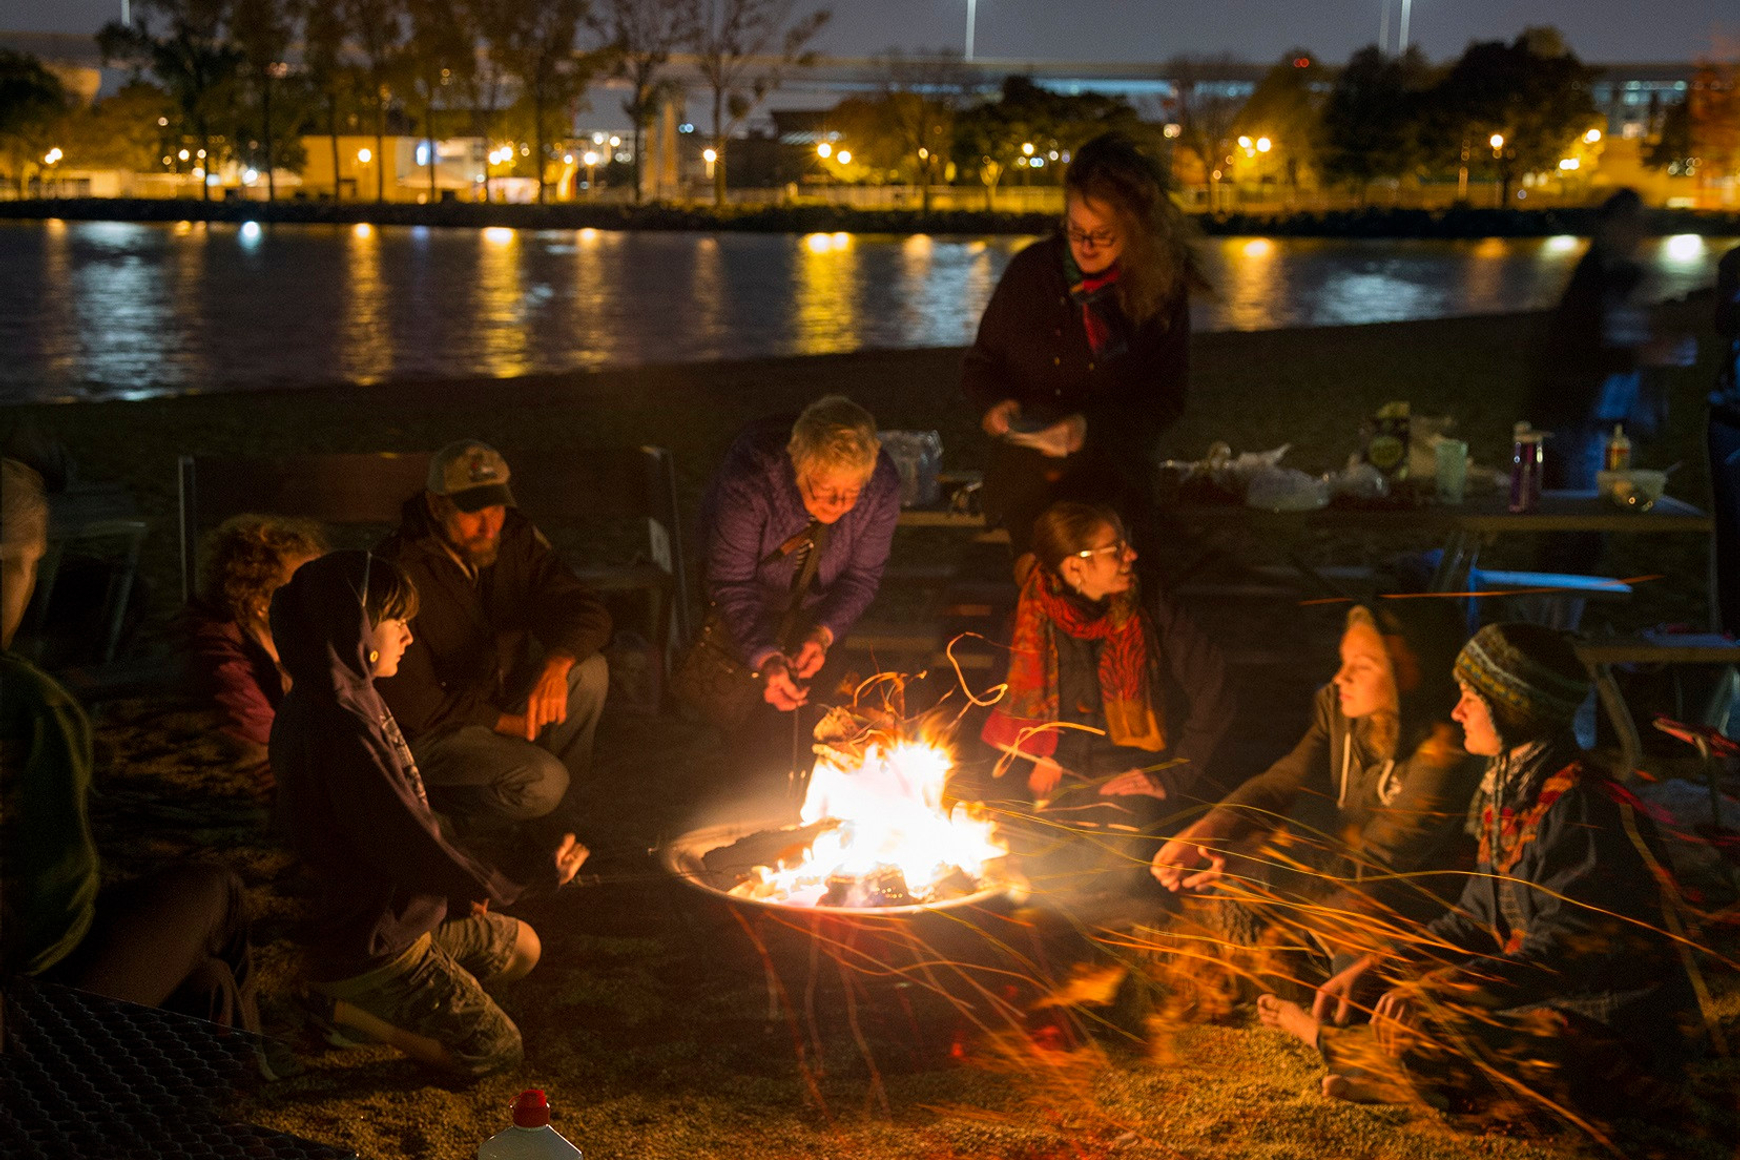 People sitting near nighttime bonfire at Lakeshore State Park